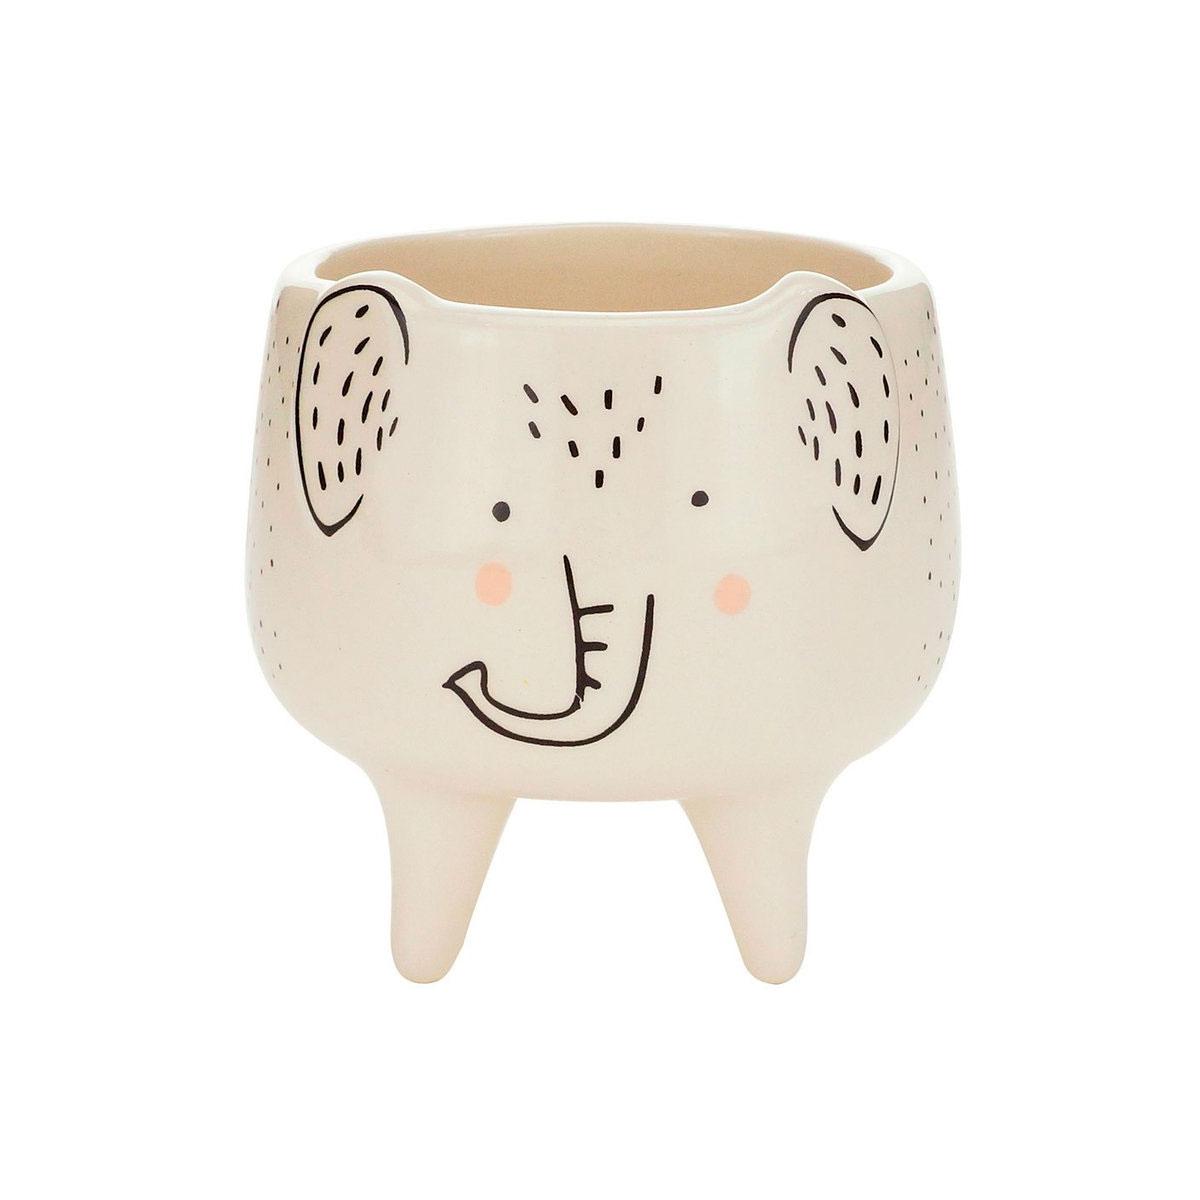 Cachepot Vaso Decorativo de Cerâmica Elefante Charmoso - Presente Super